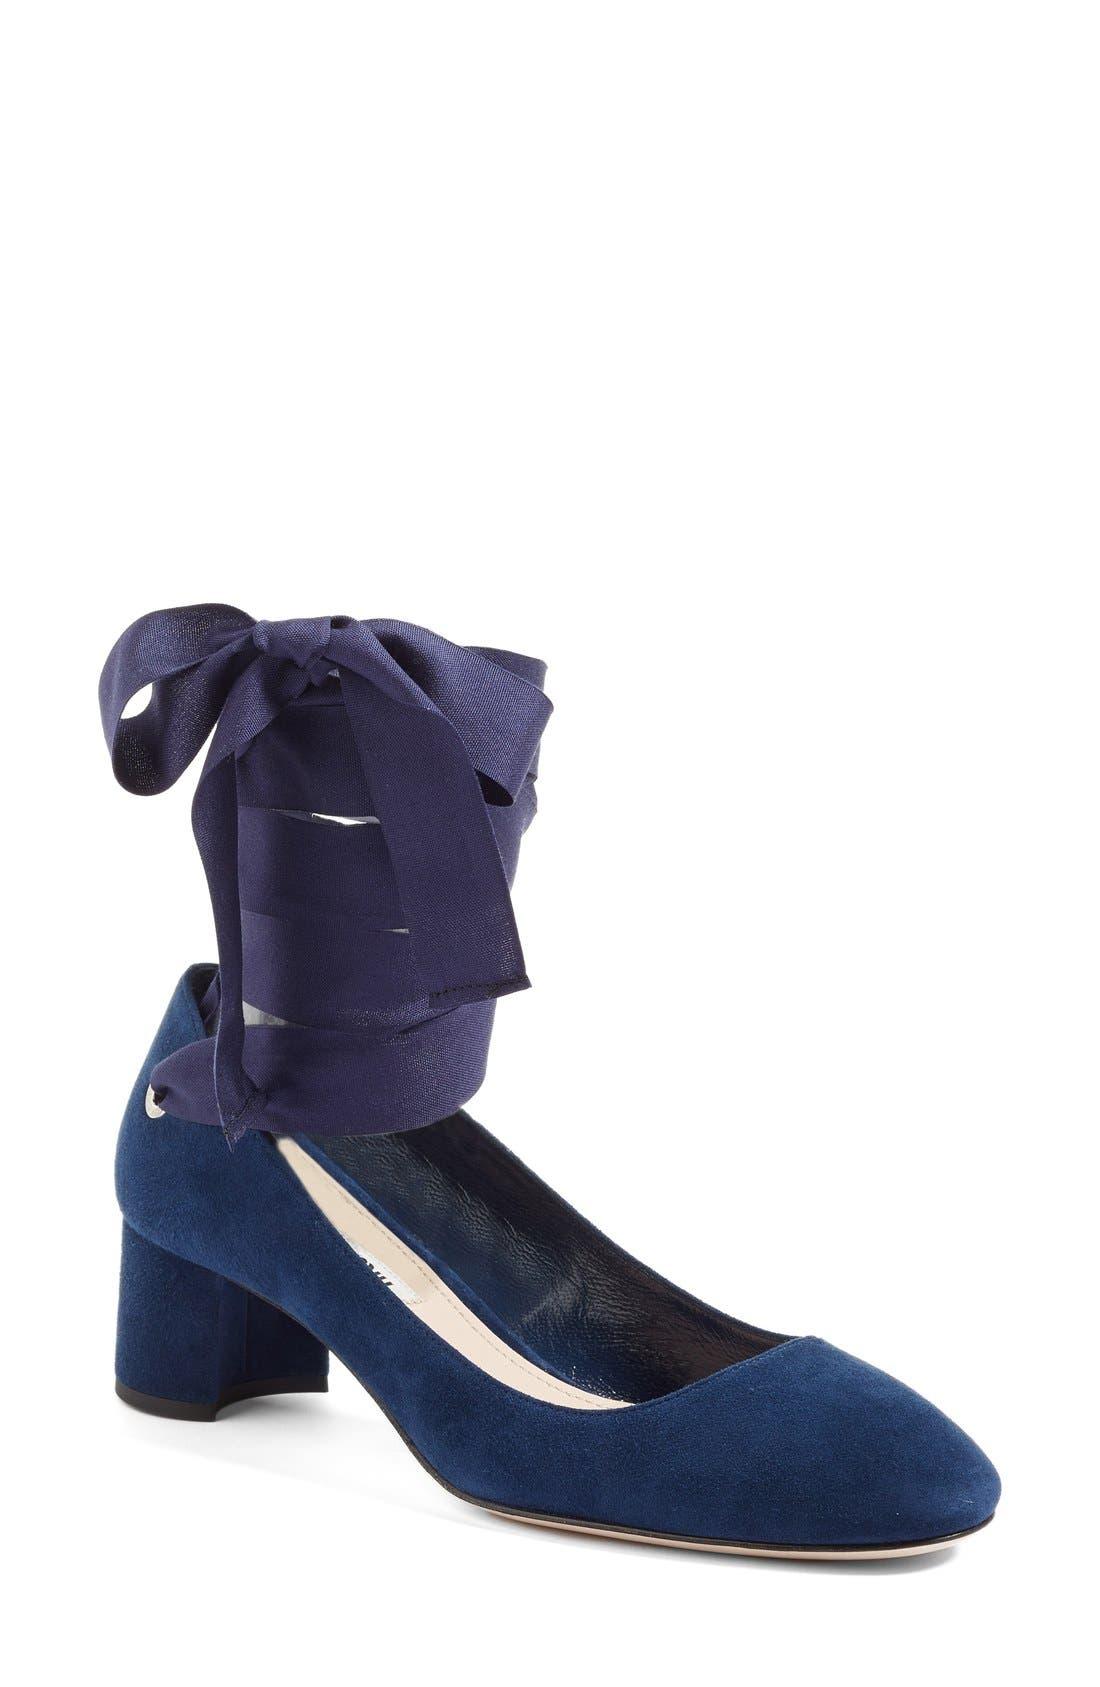 Alternate Image 1 Selected - Miu Miu Ribbon Lace Wraparound Pump (Women)